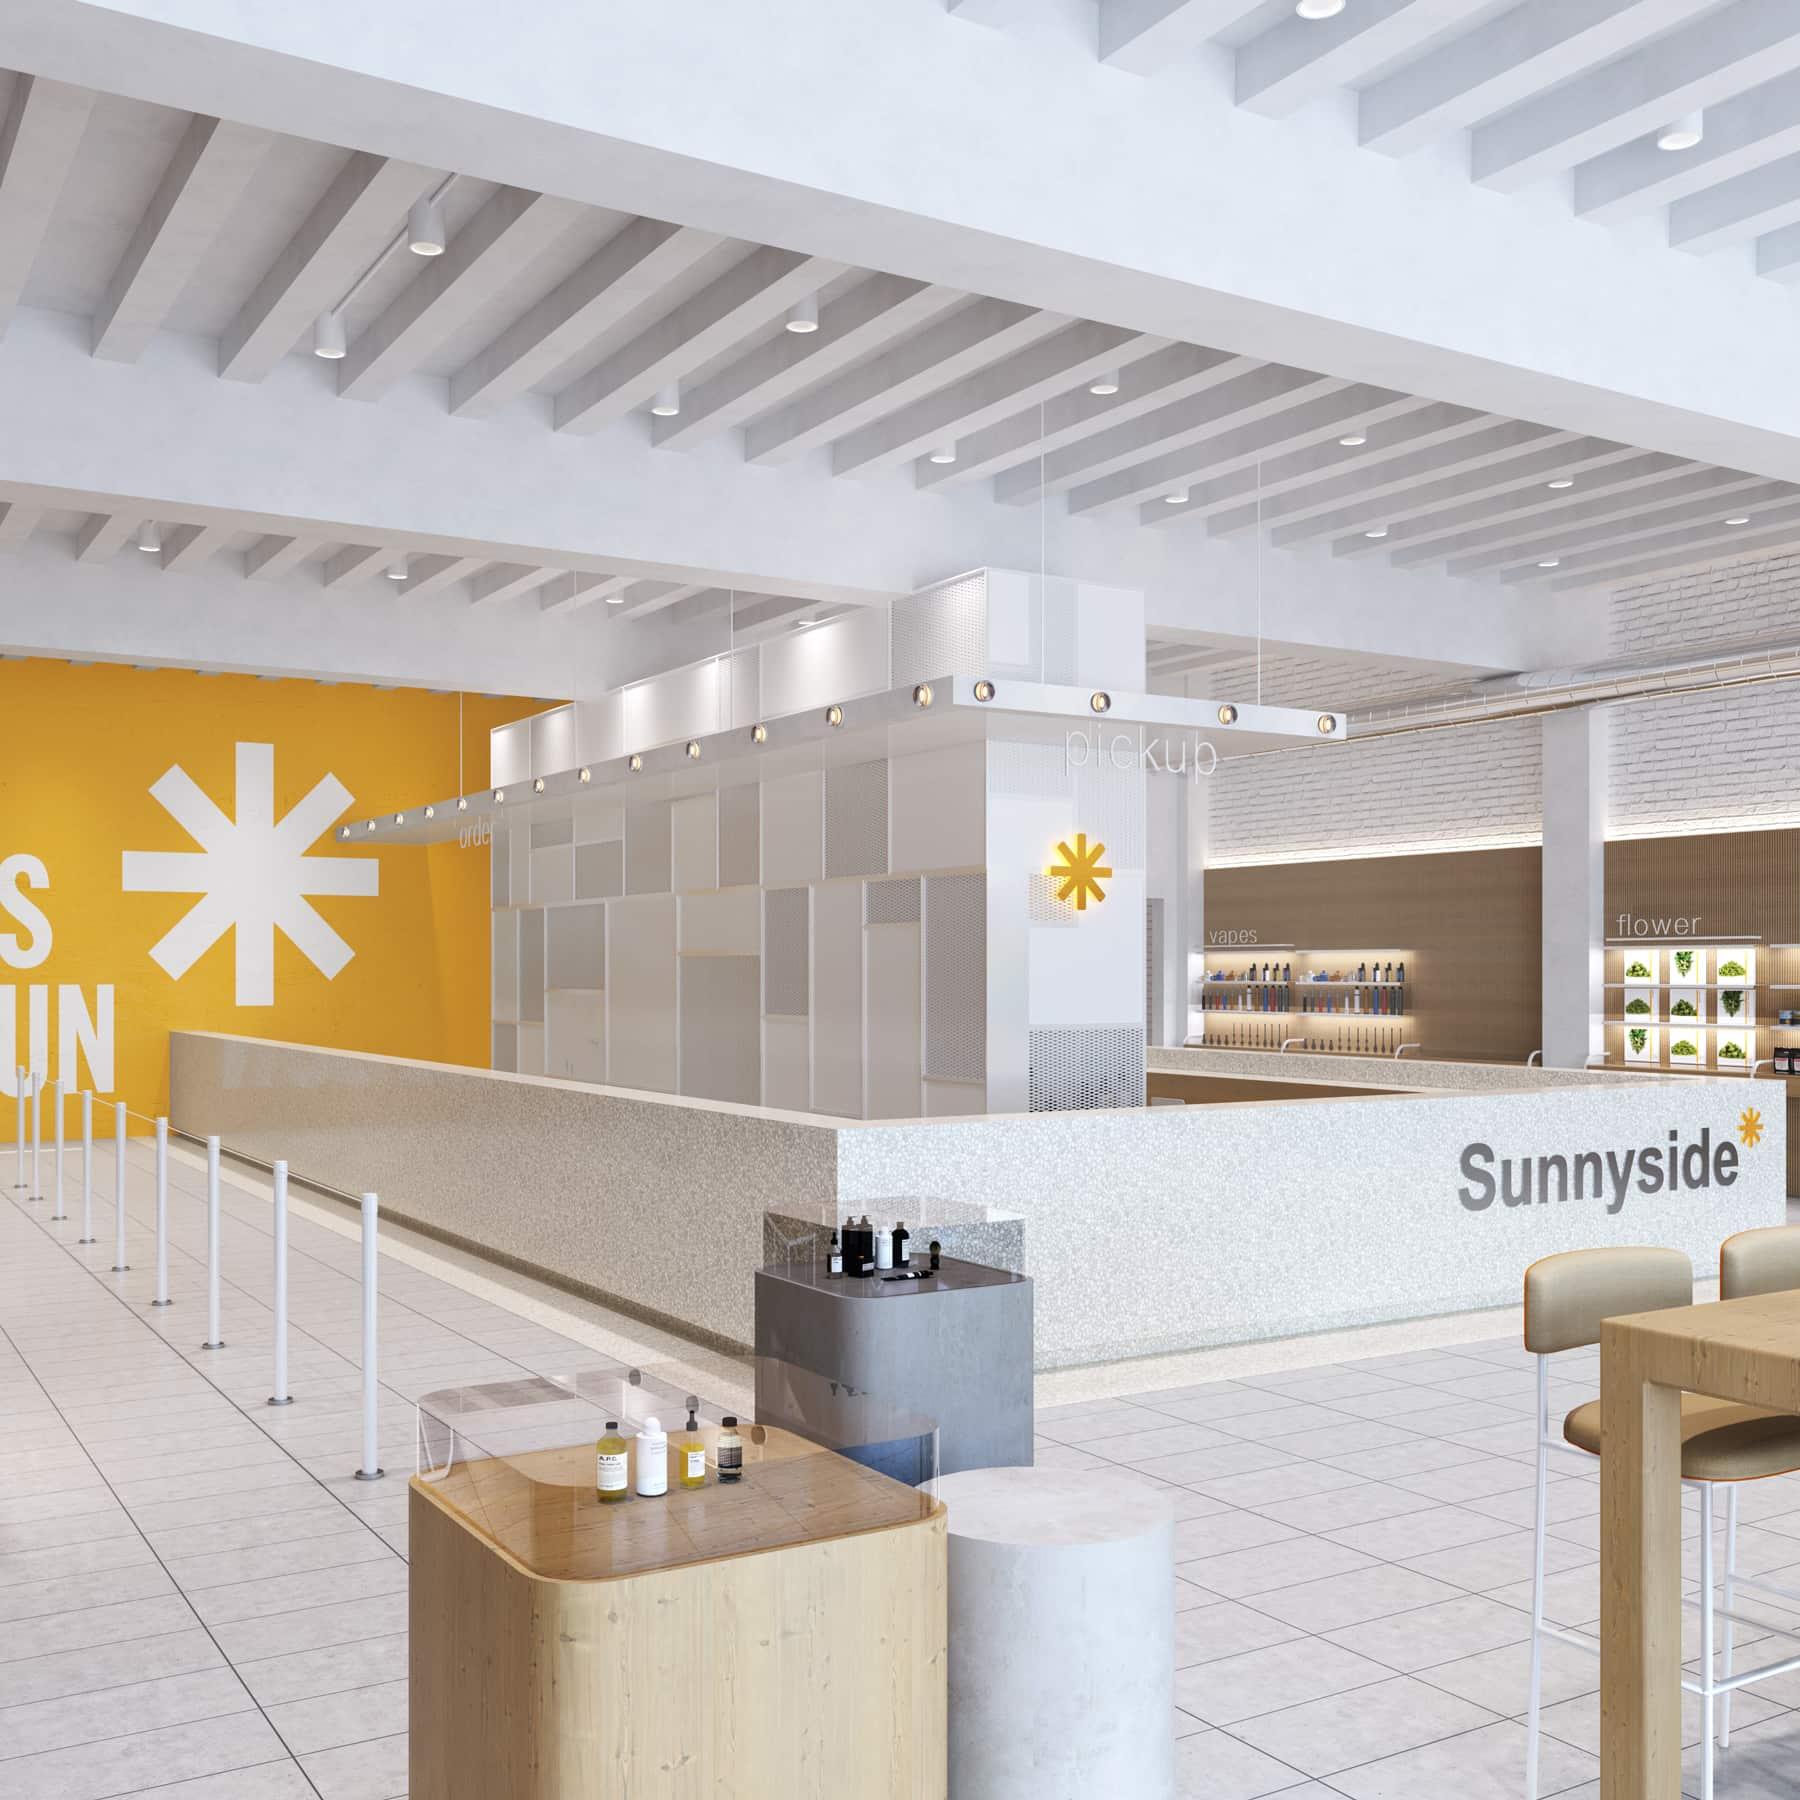 Sunnyside Dispensary interior.